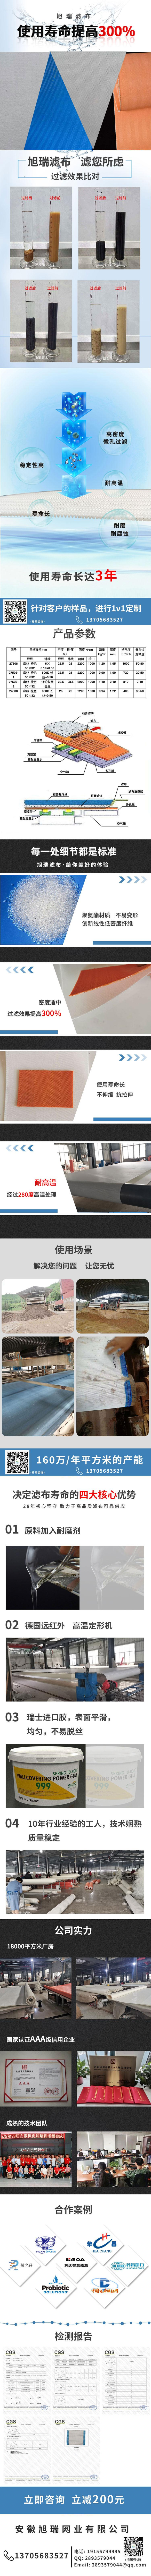 resource/images/f798af787f934f0195363b484055129a_8.jpg